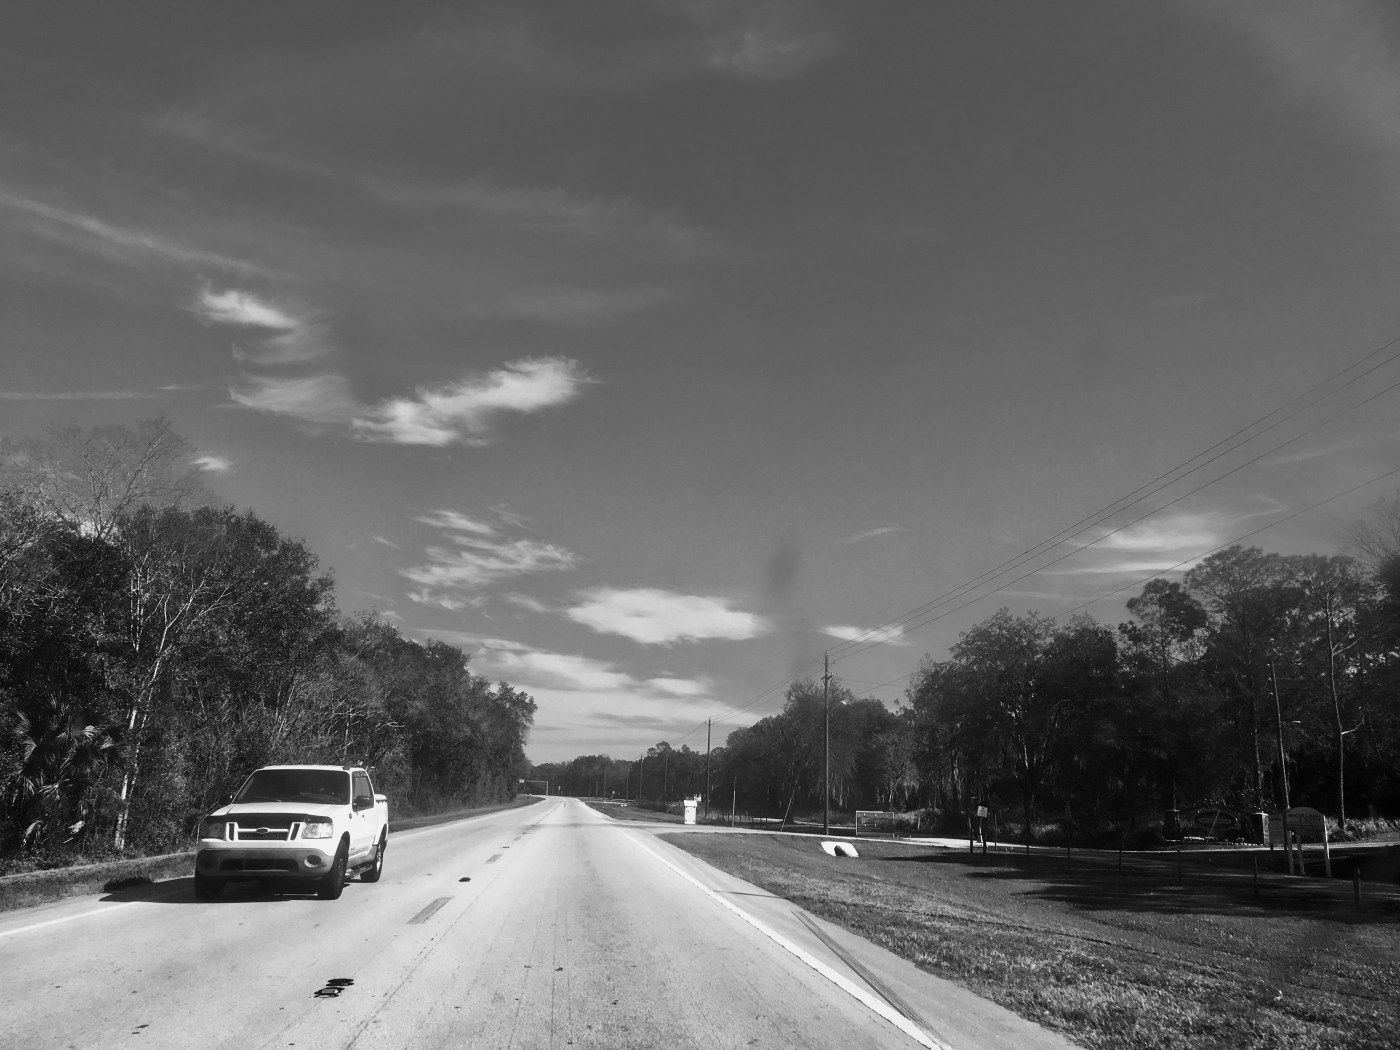 Thonotosassa, Hillsborough County Fl